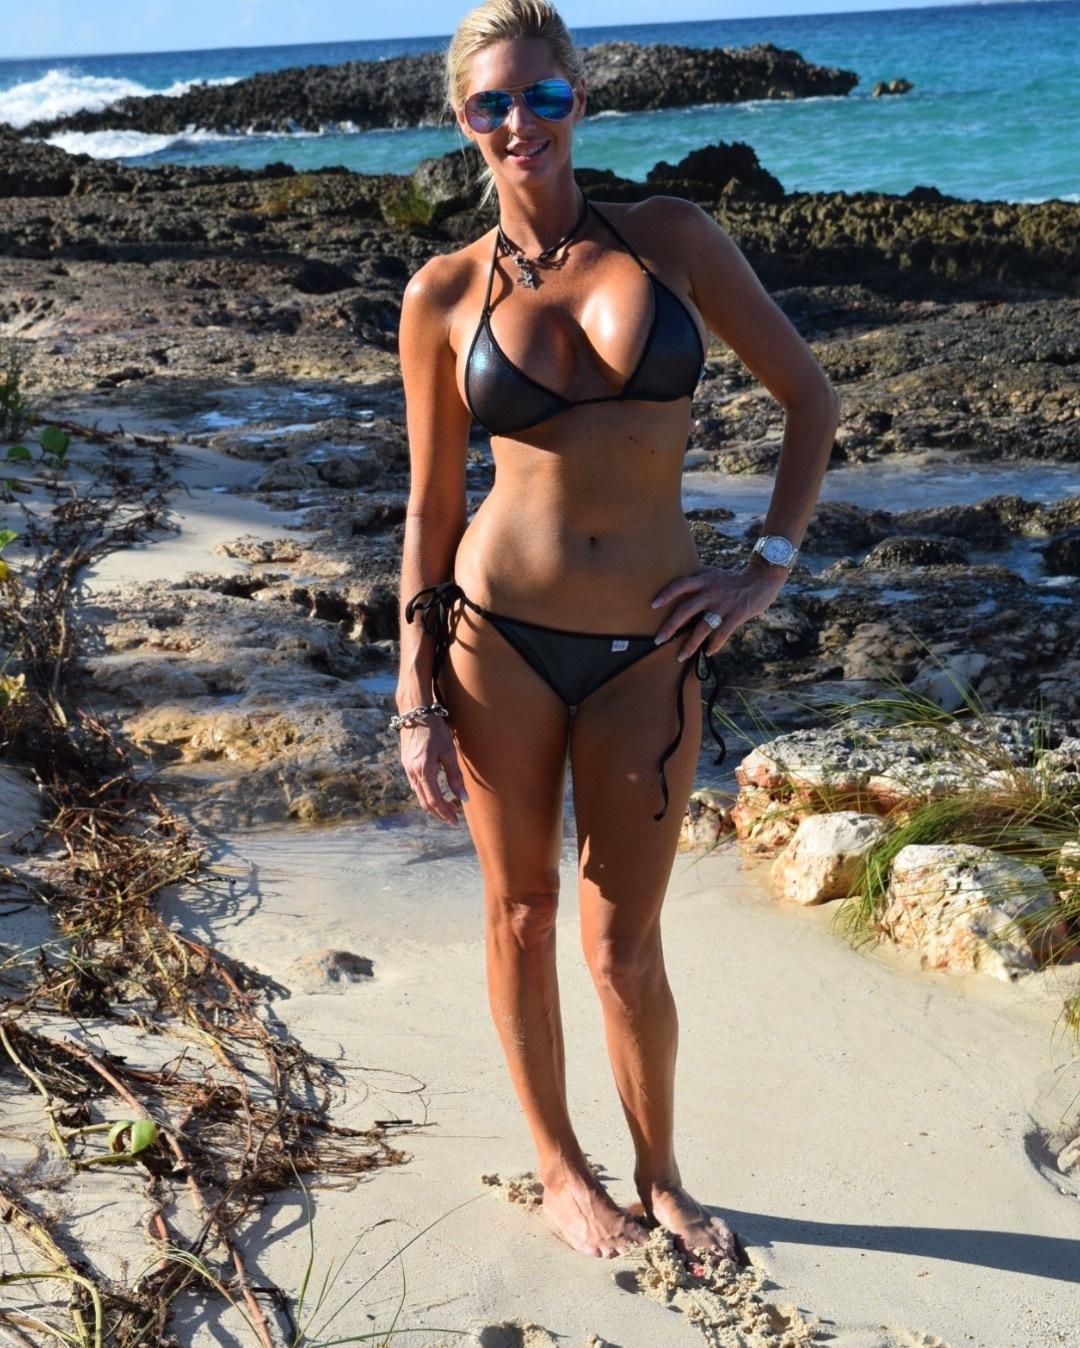 Bellasouth Lavidahermosa Onlyfans Nudes Leaks 0005